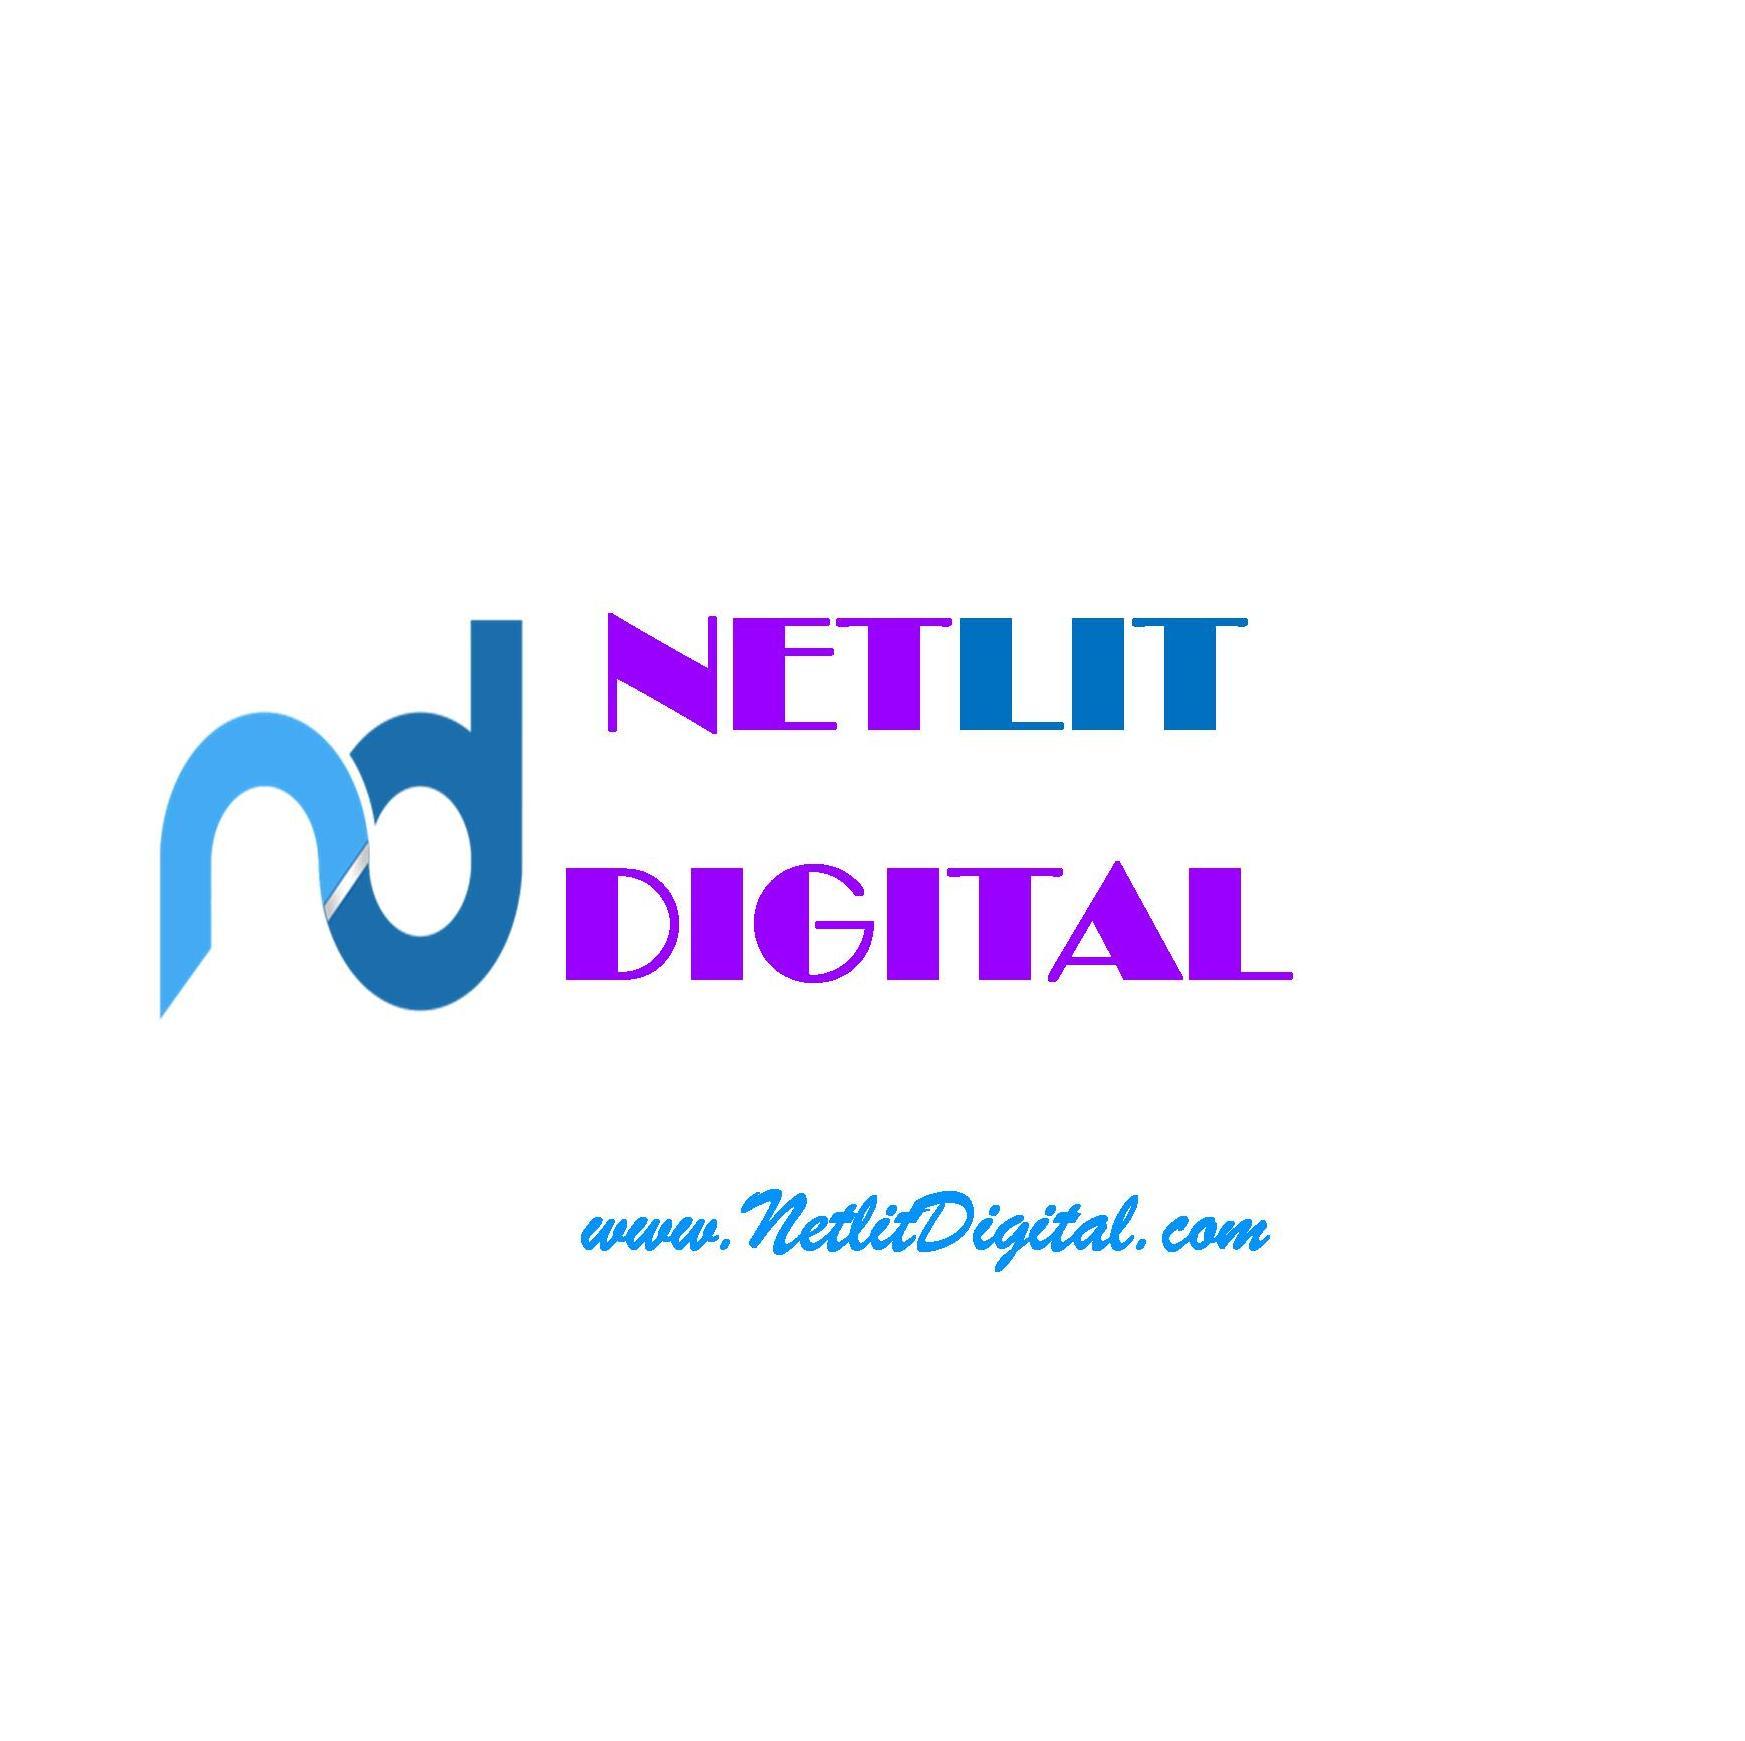 NETLIT DIGITAL KENYA